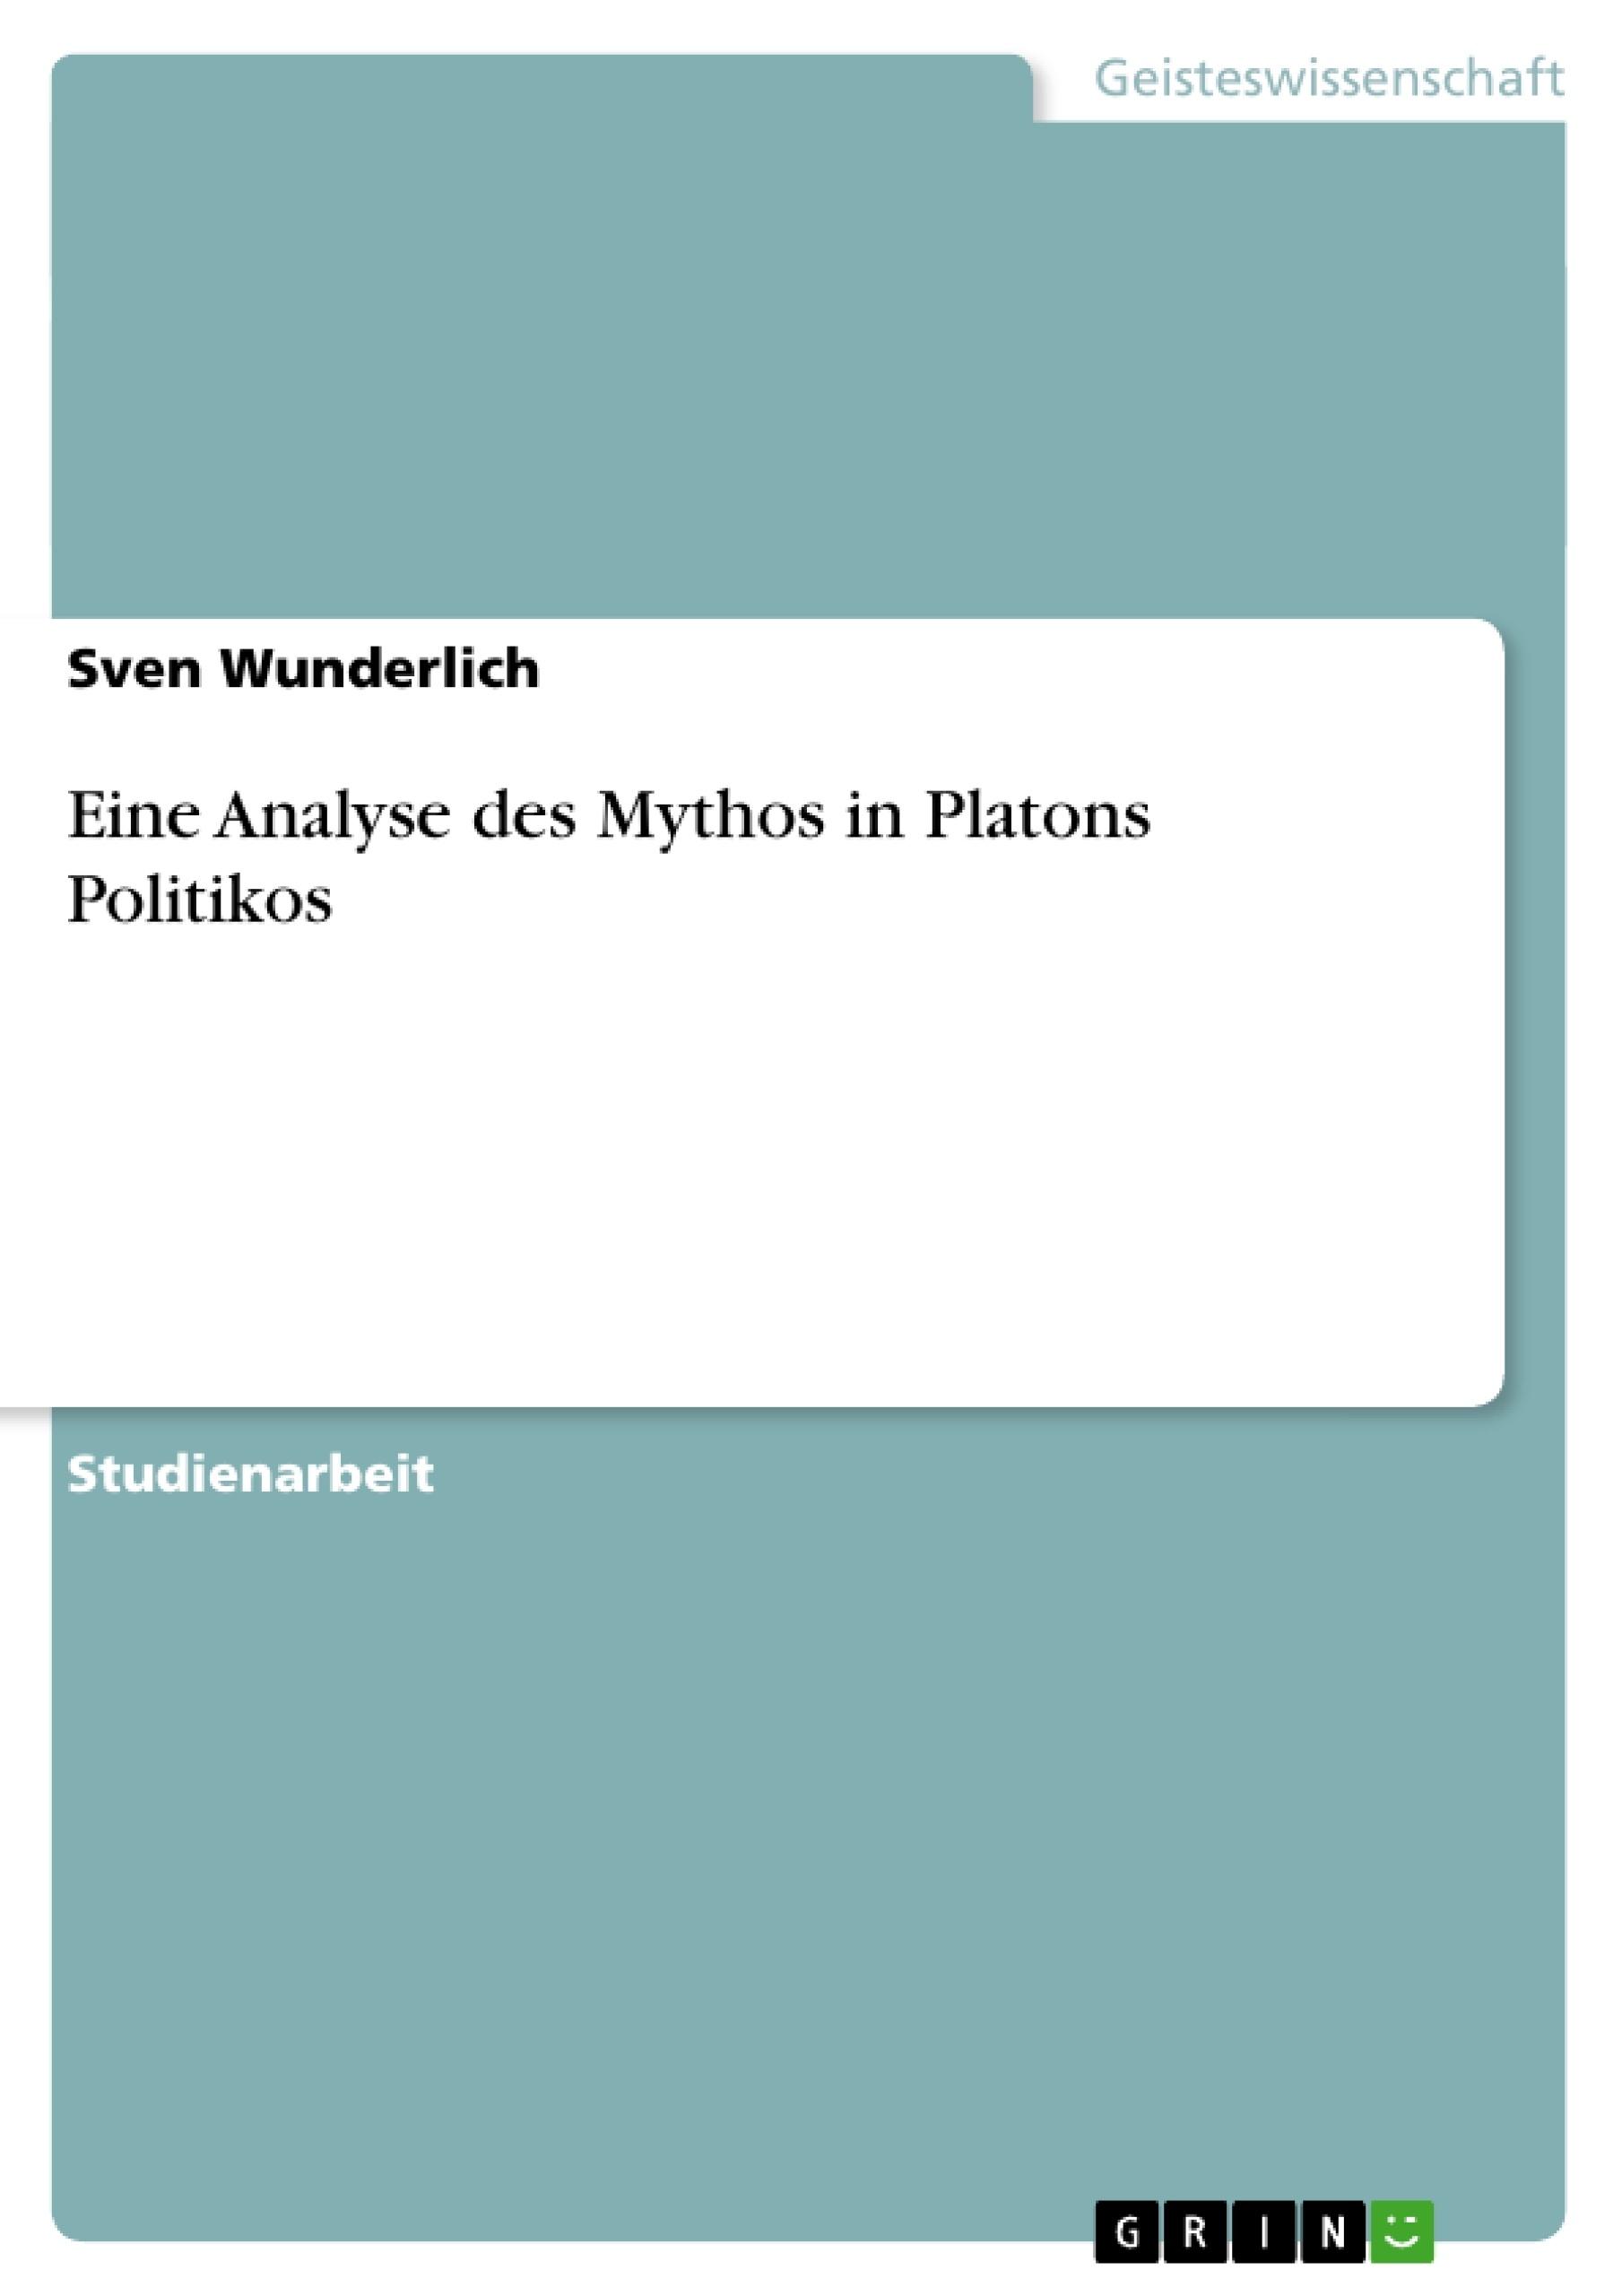 Titel: Eine Analyse des Mythos in Platons Politikos